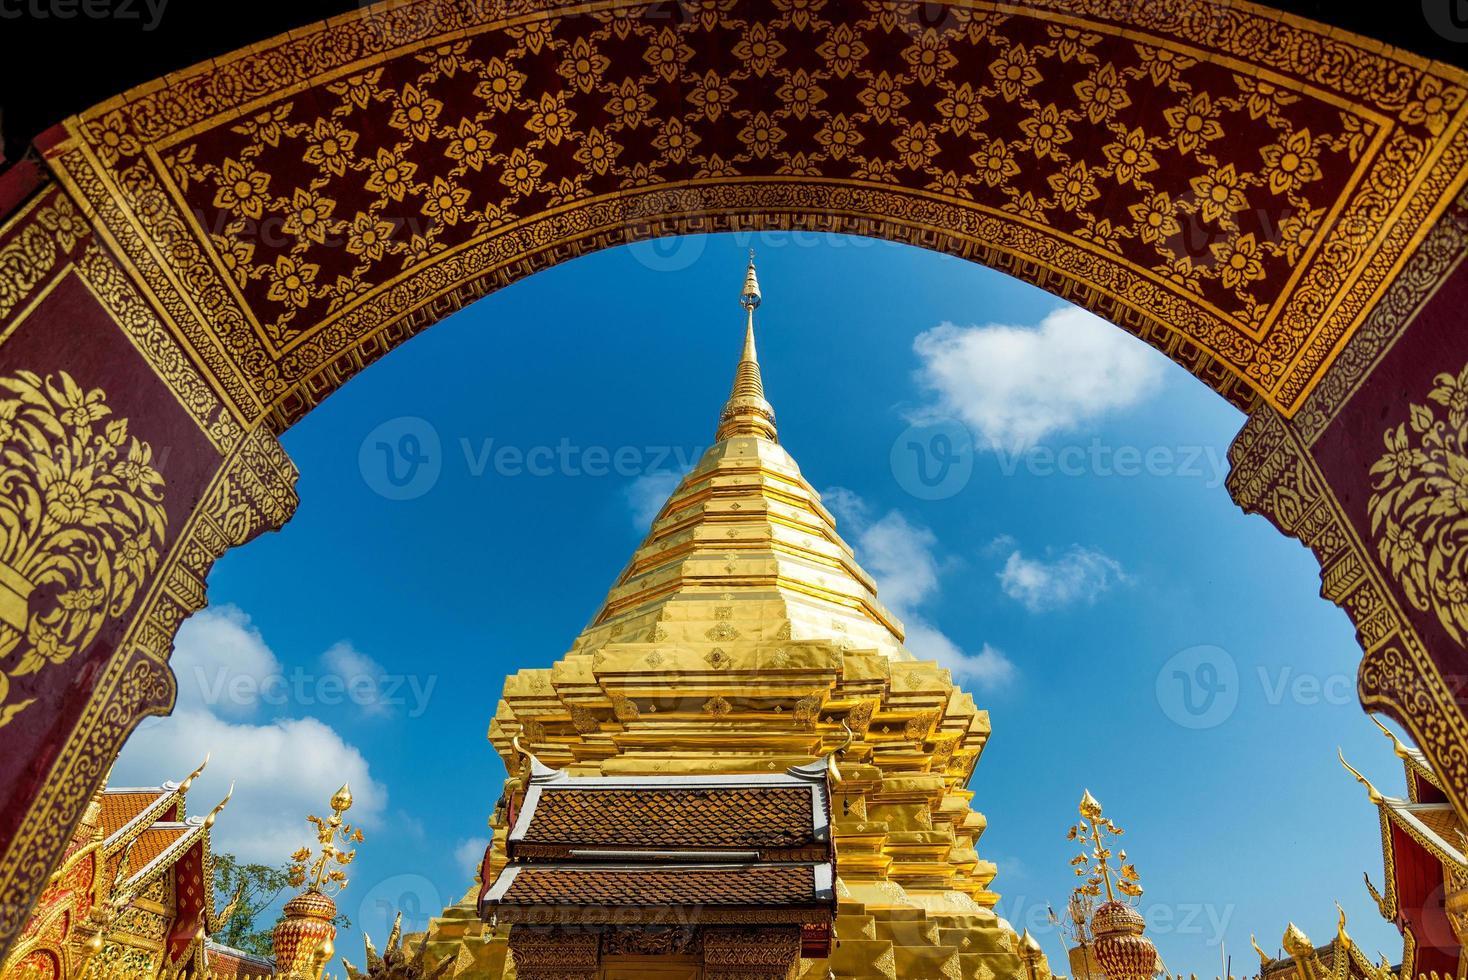 wat phra att doi suthep templet i Chiang Mai, Thailand foto